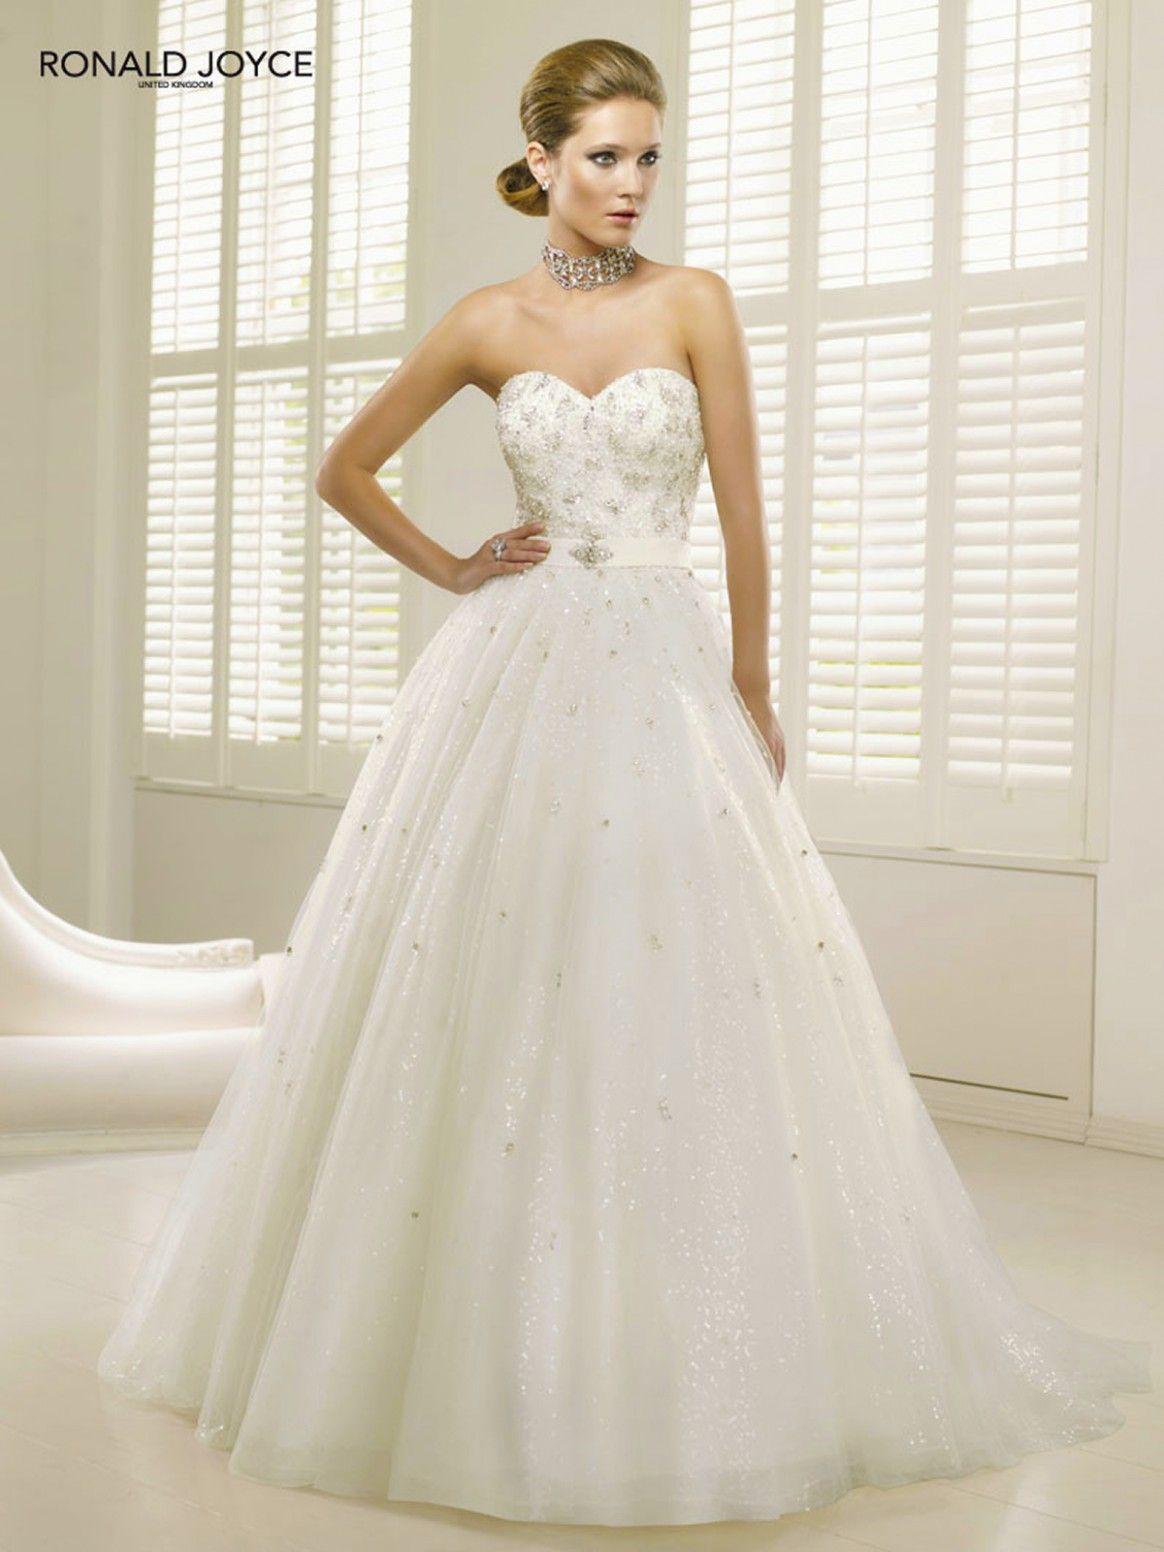 Ronald Joyce Princess Wedding Dress Bruiloft Baljurken Trouwjurk Baljurk Trouwjurk [ 1552 x 1164 Pixel ]